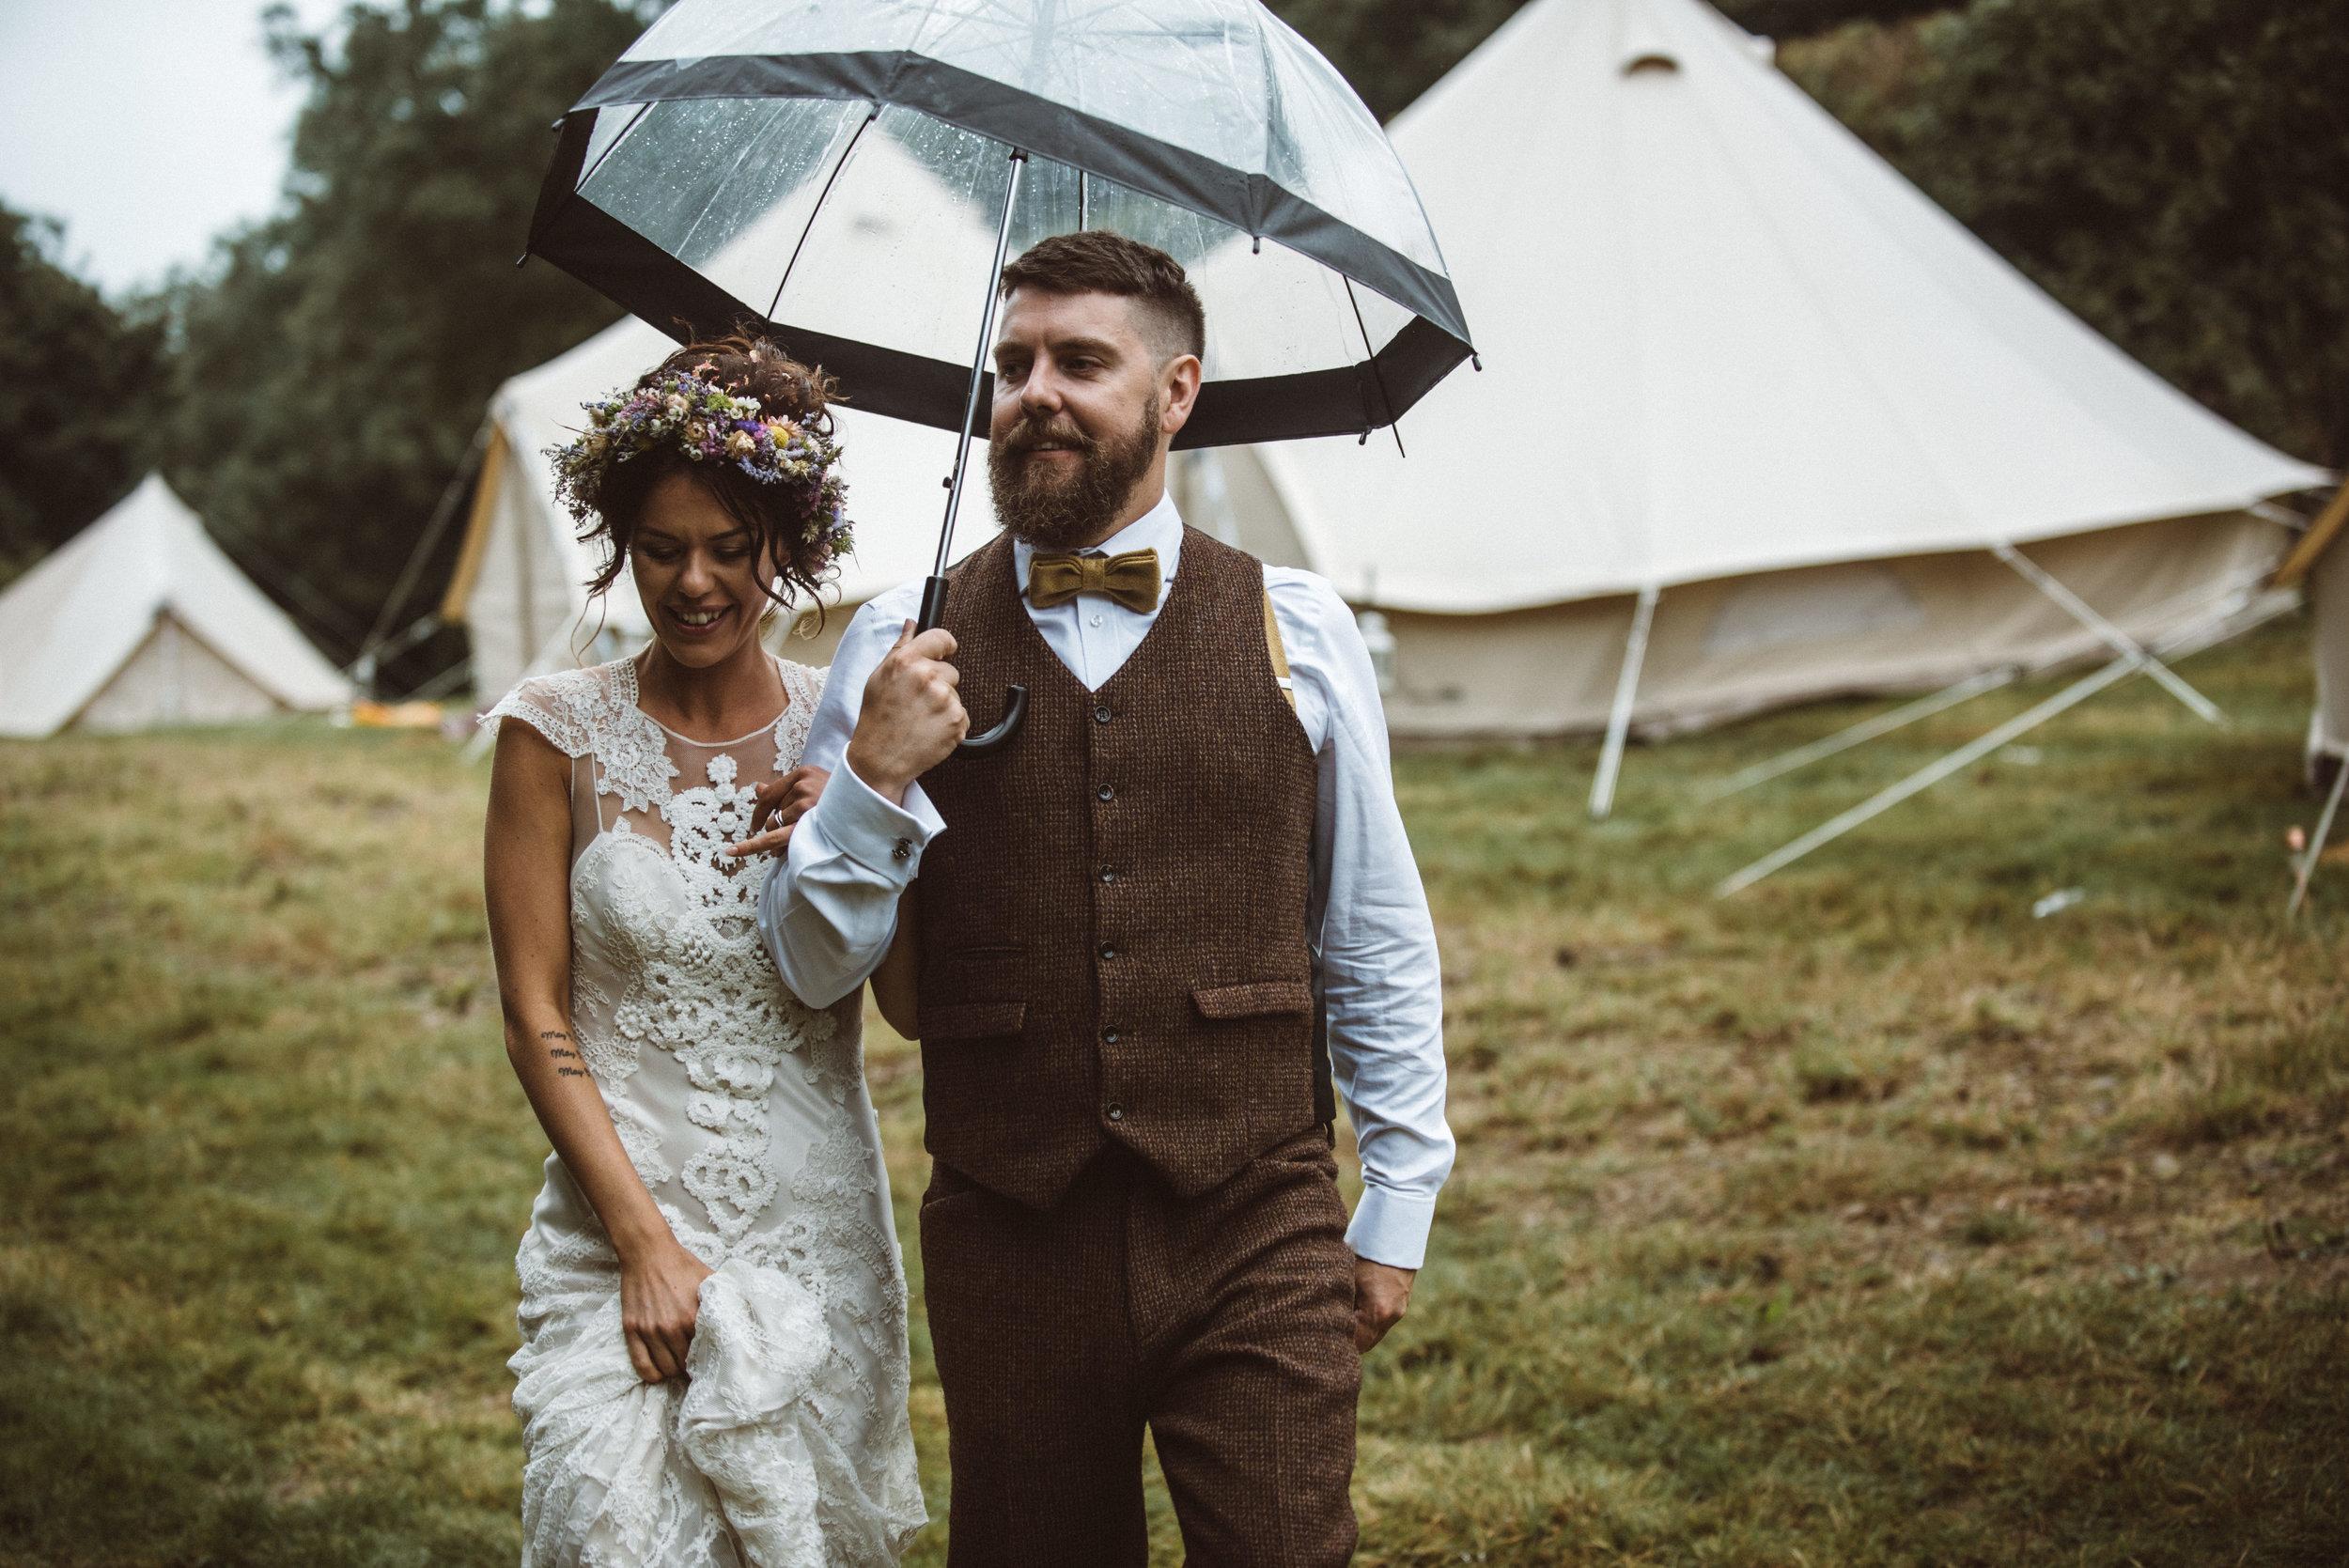 pengenna-manor-wedding-photographer-75.jpg